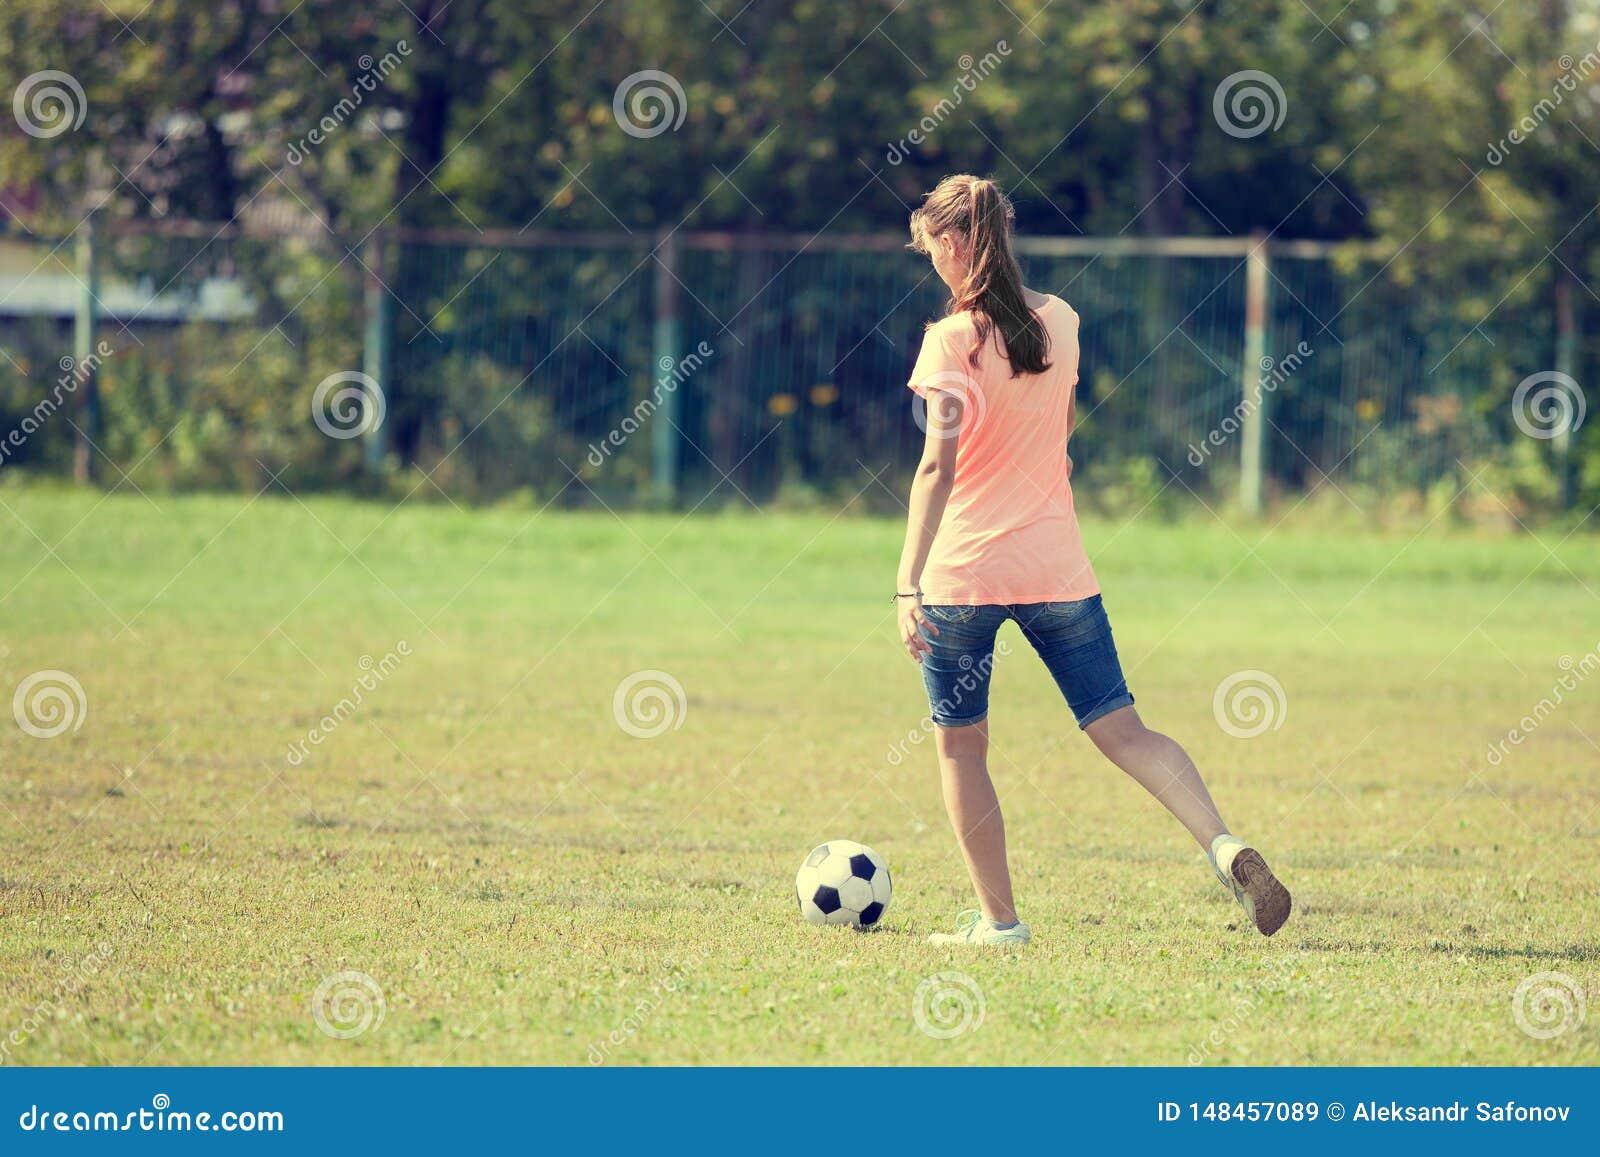 Athlete girl kicks the ball played soccer